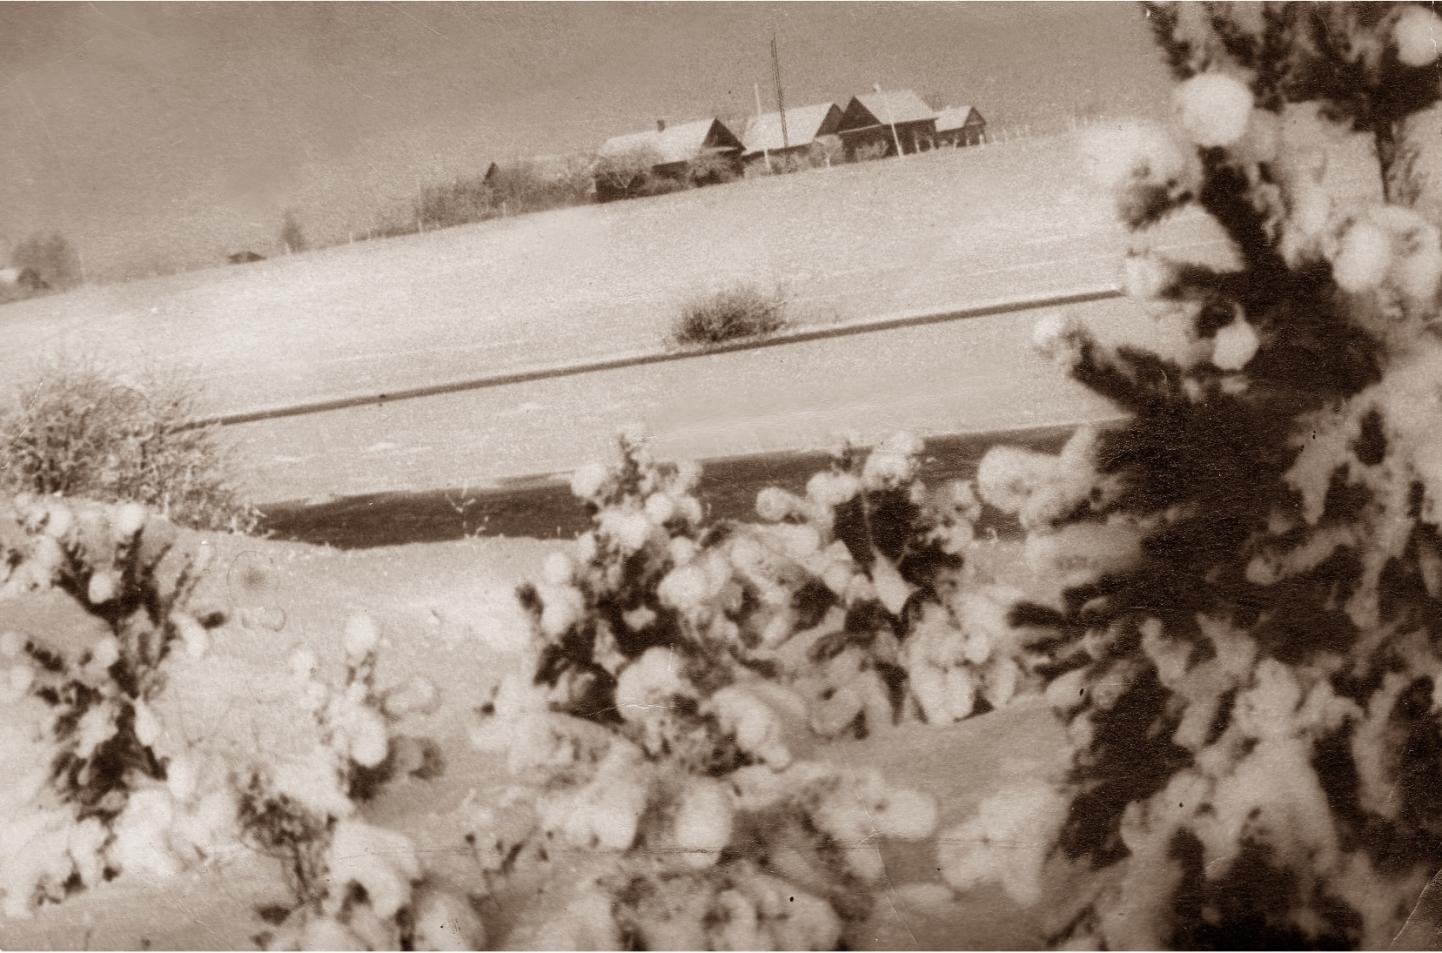 Profesoriaus, agronomo Petro Vasinausko brolio Jono Vasinausko sodyba. 1945 m.